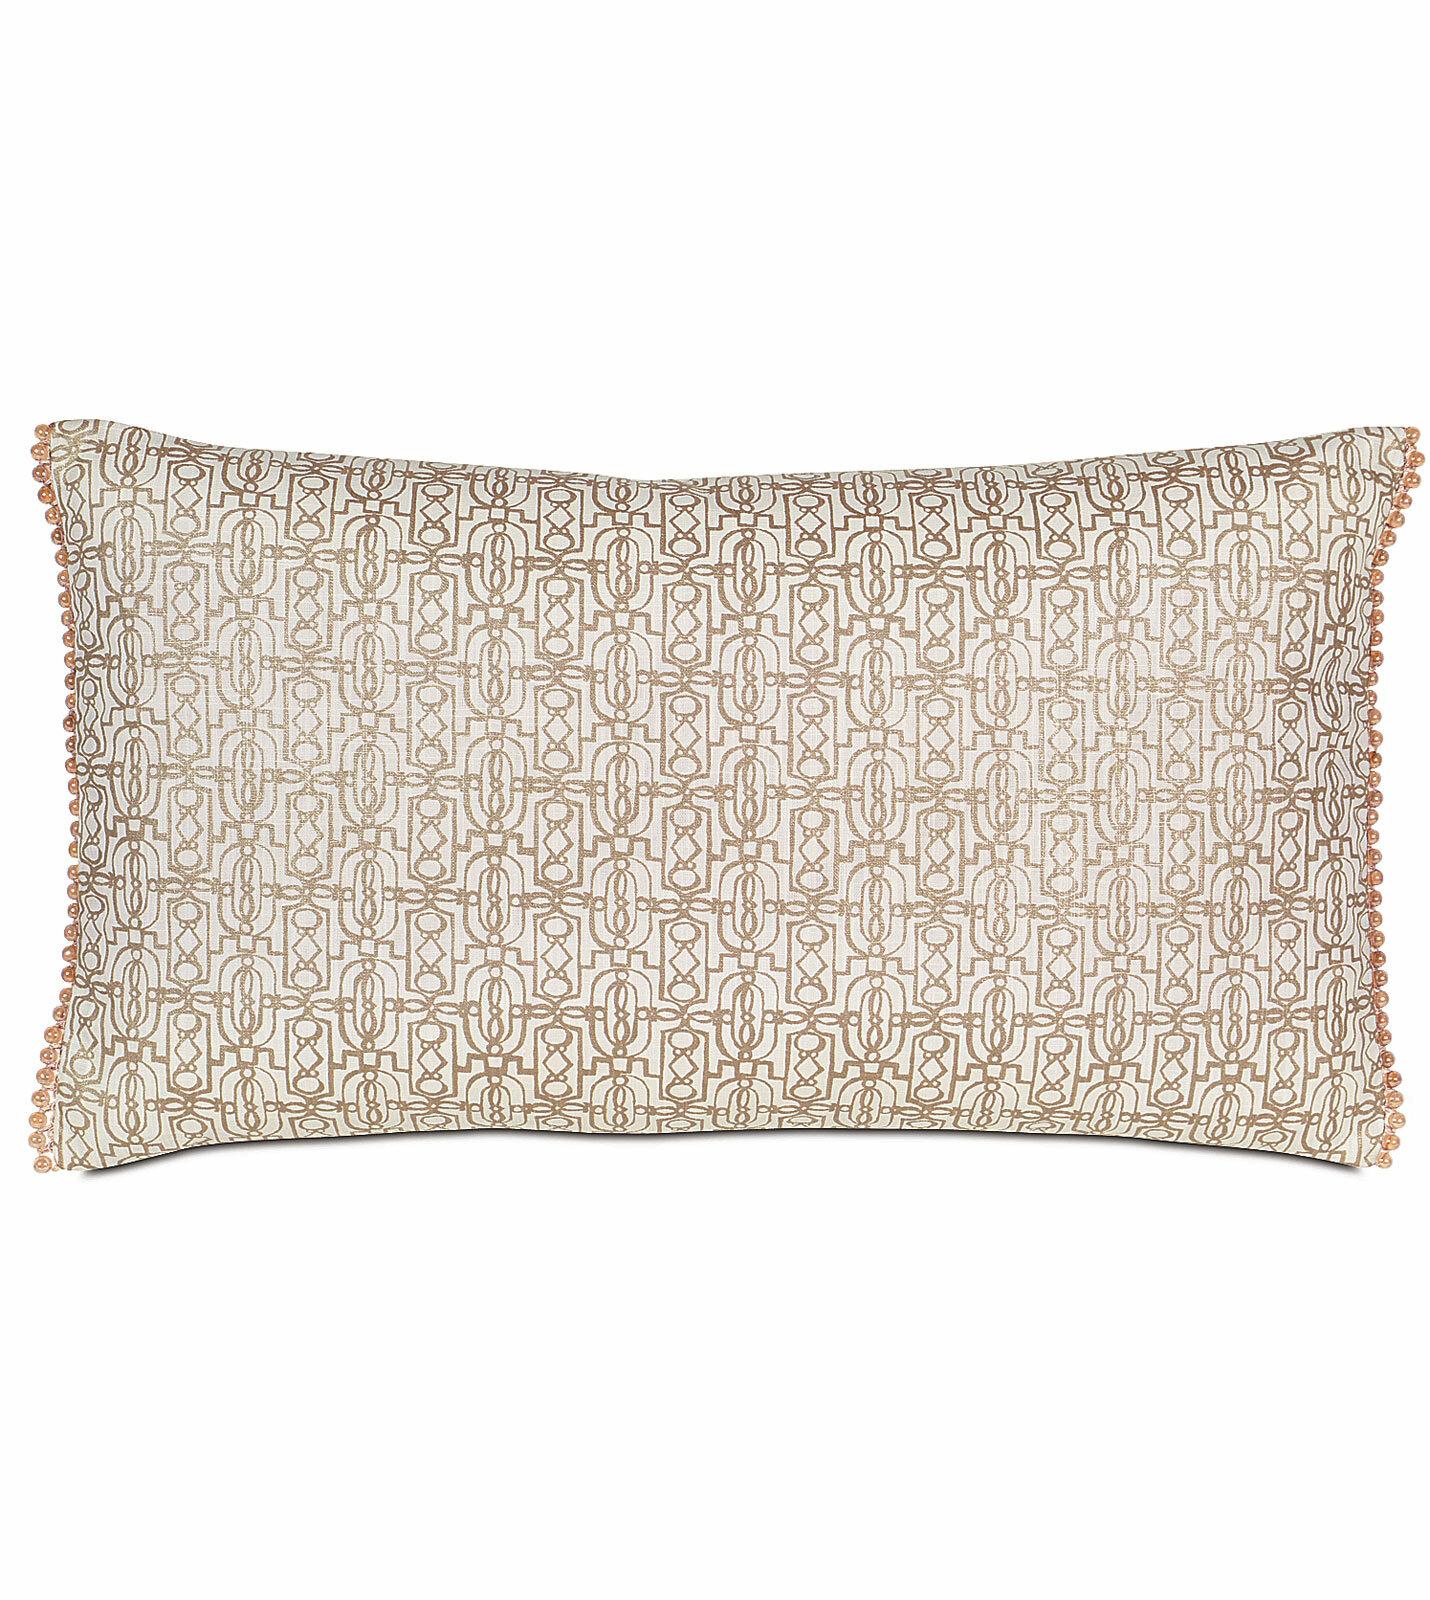 Eastern Accents Halo Cordova Cotton Lumbar Pillow Perigold